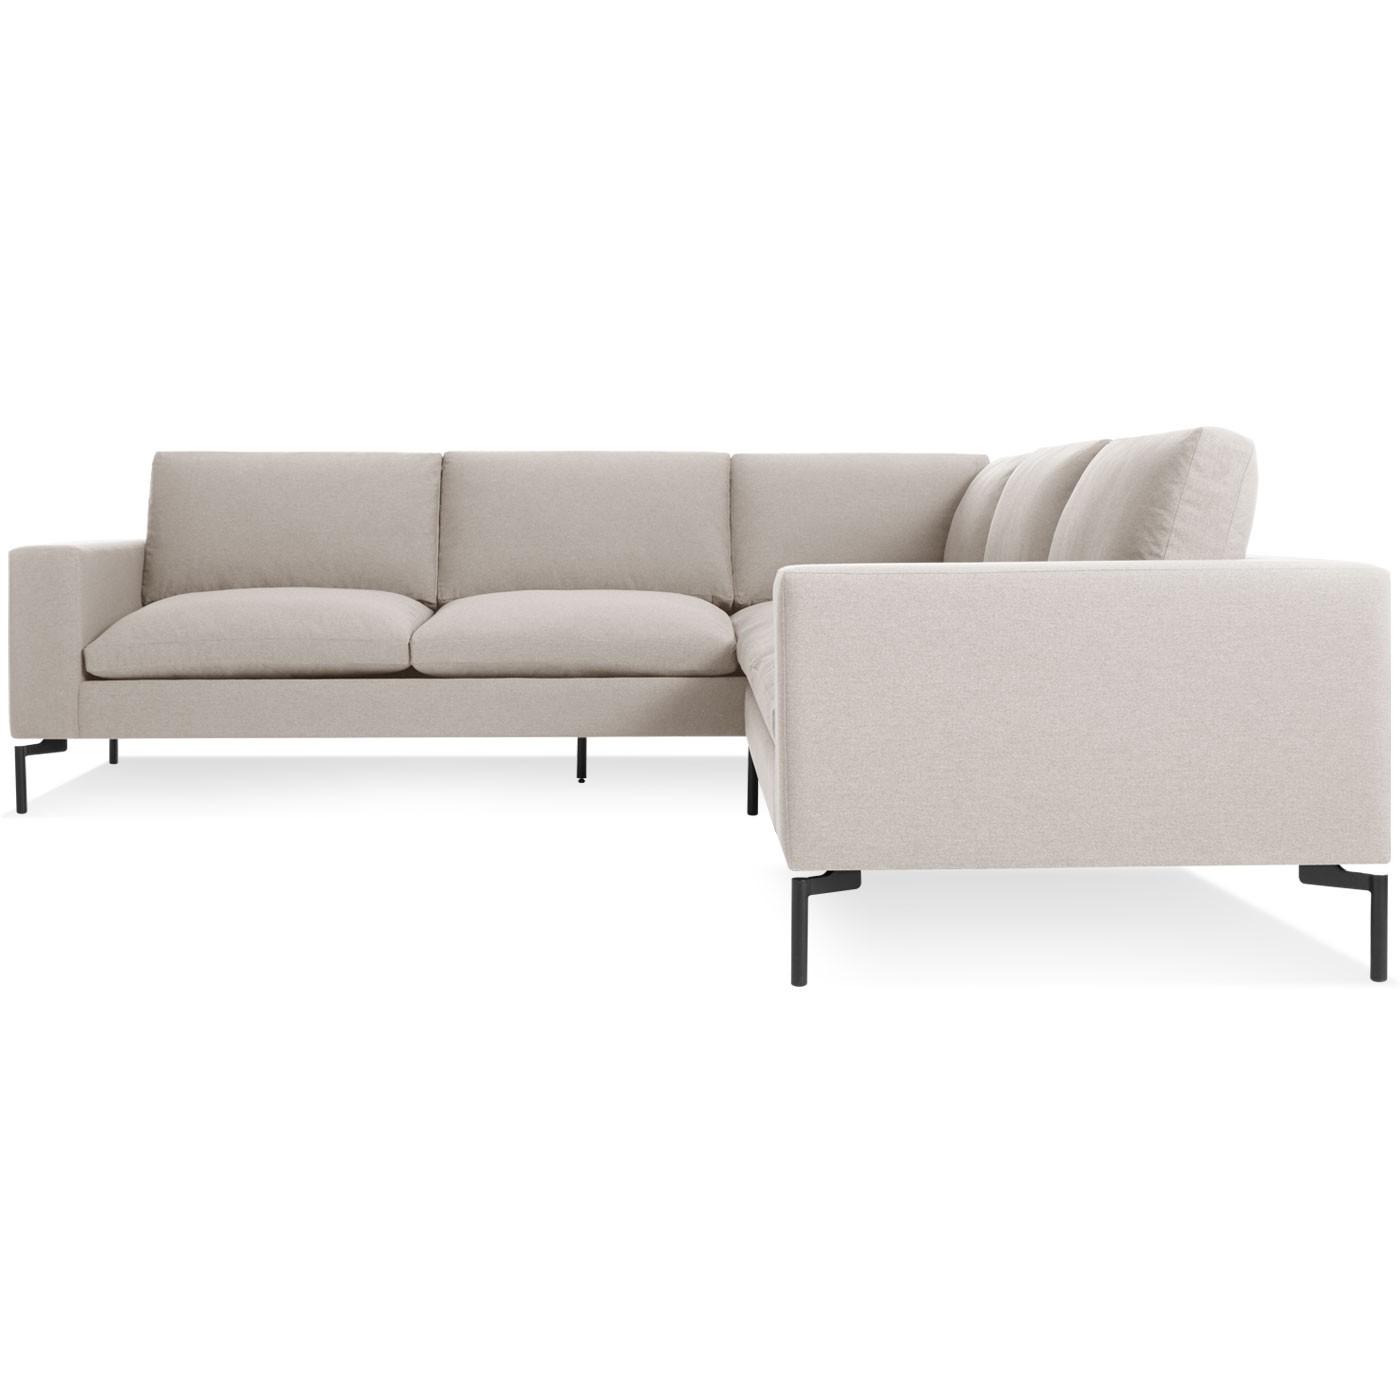 New Standard Sectional Sofa Small By Blu Dot Hub Modern Home